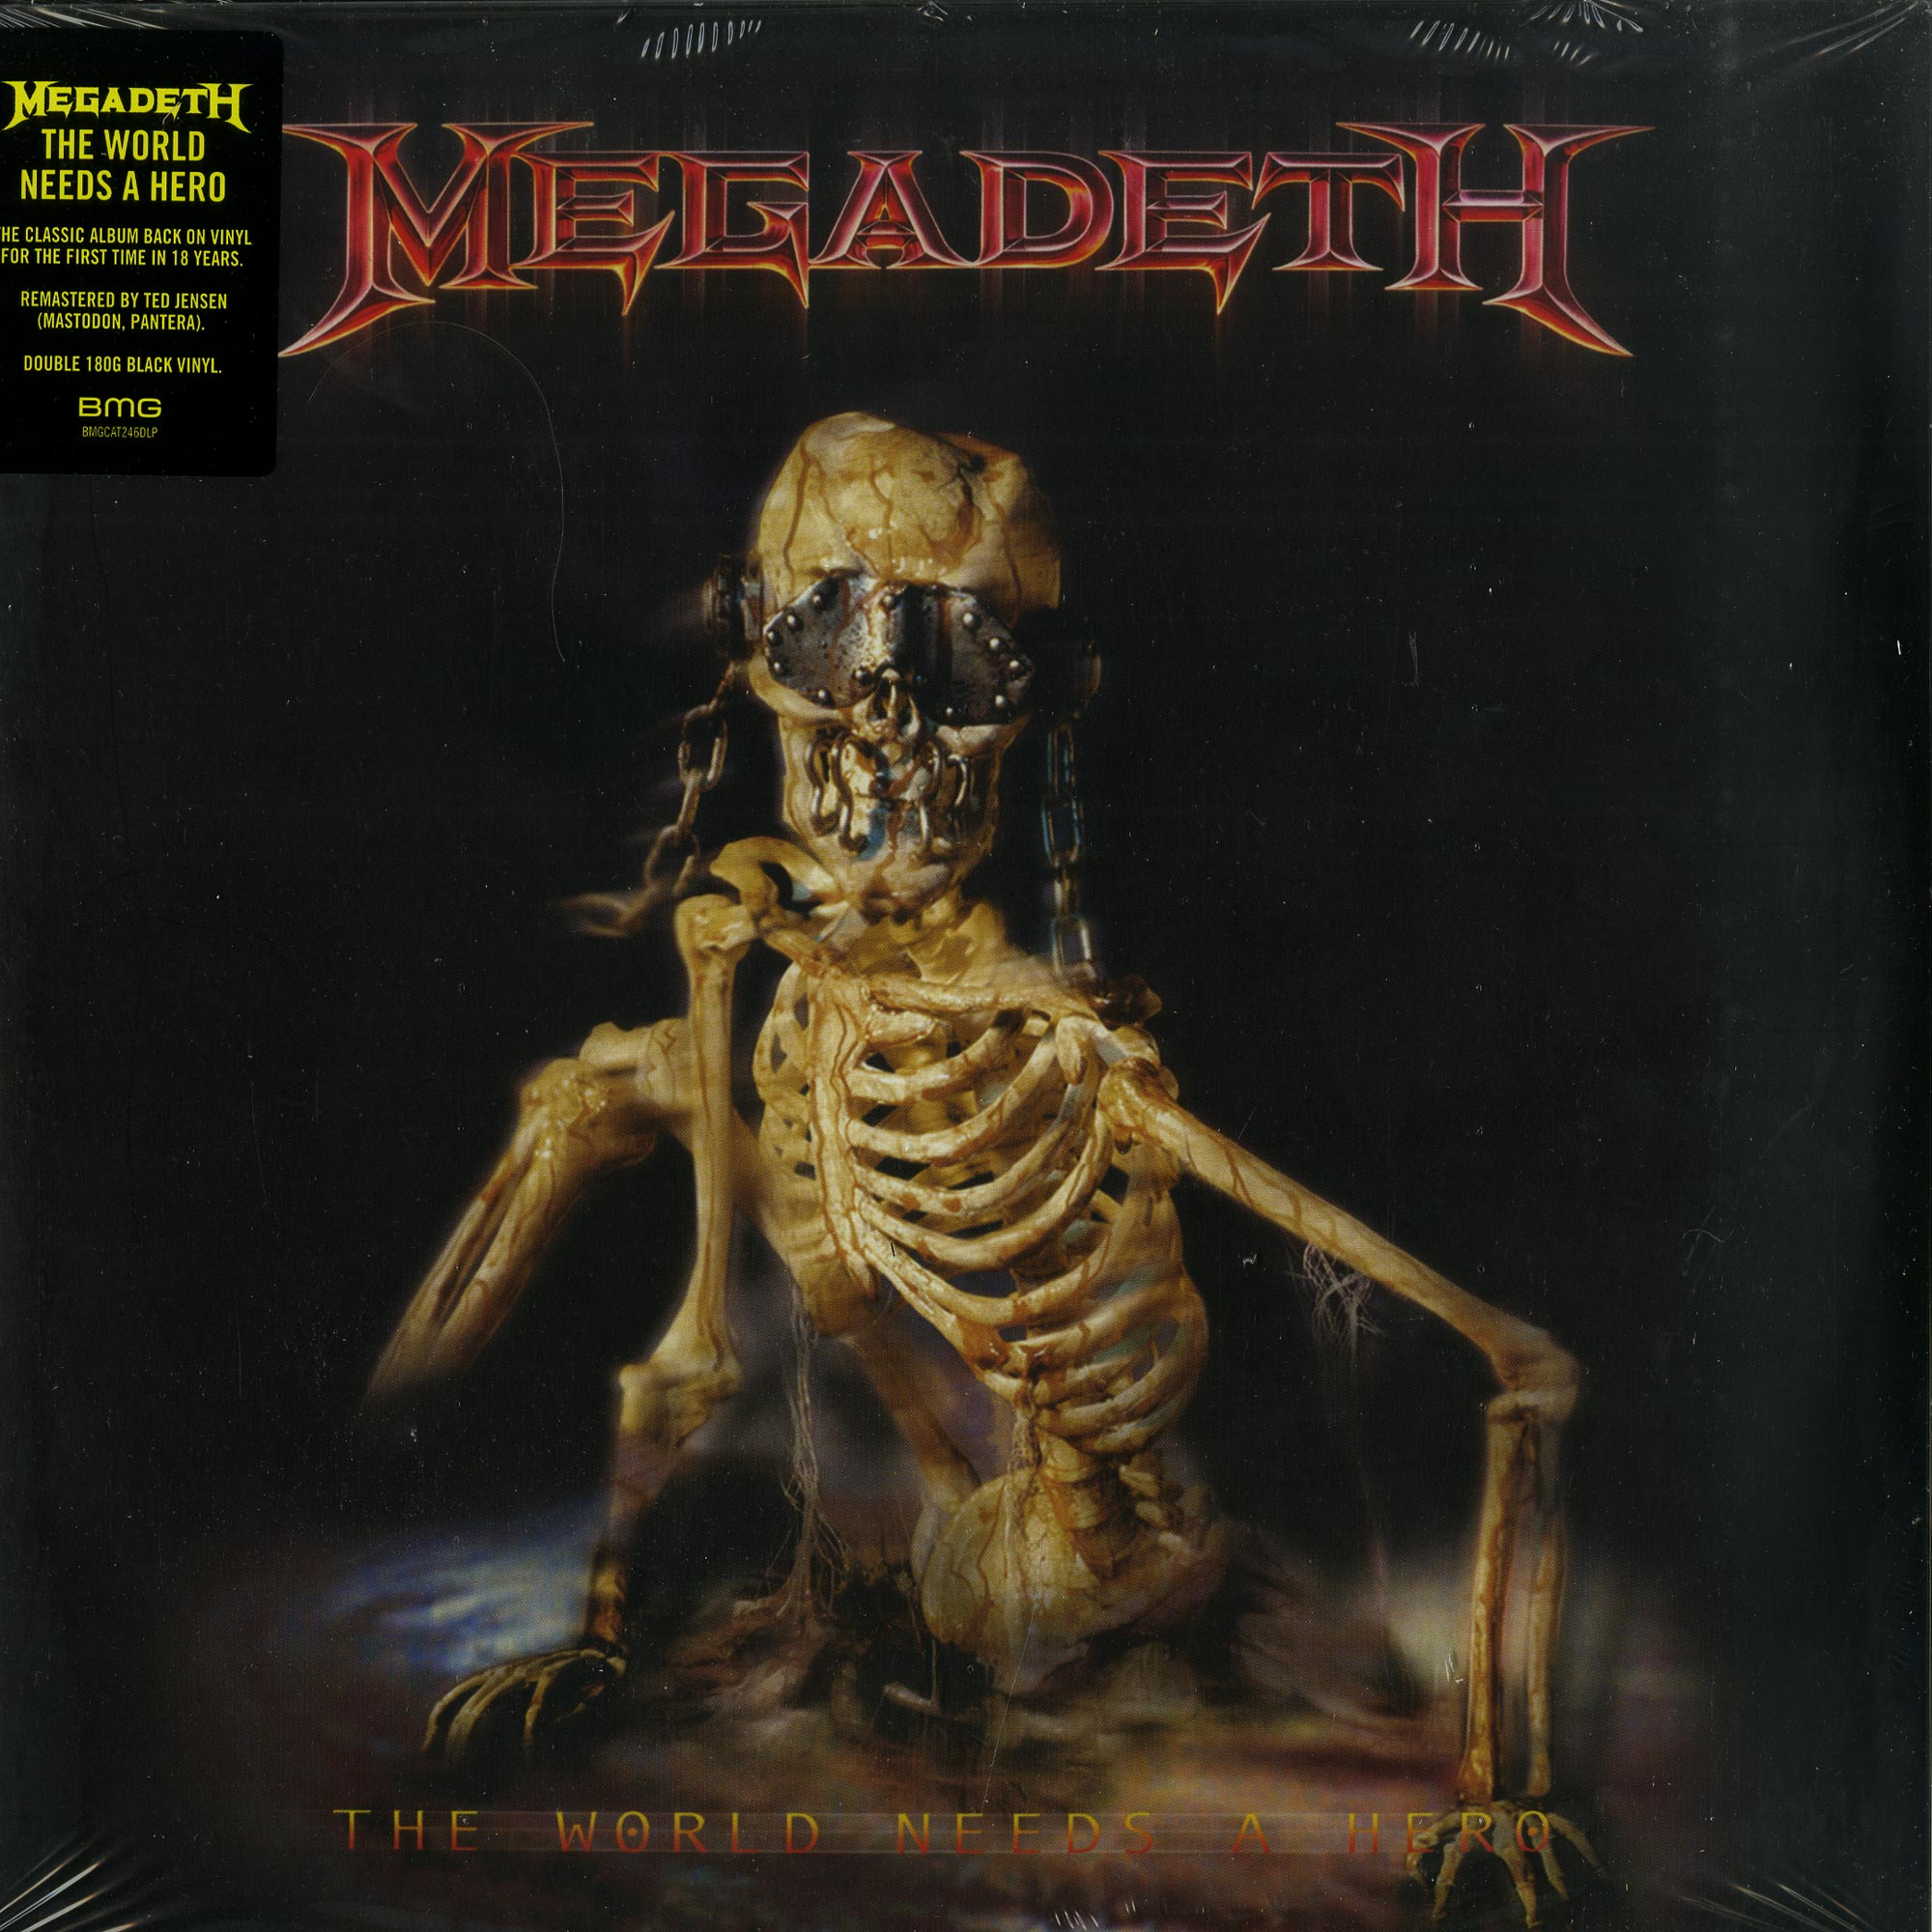 Megadeath - THE WORLD NEEDS A HERO